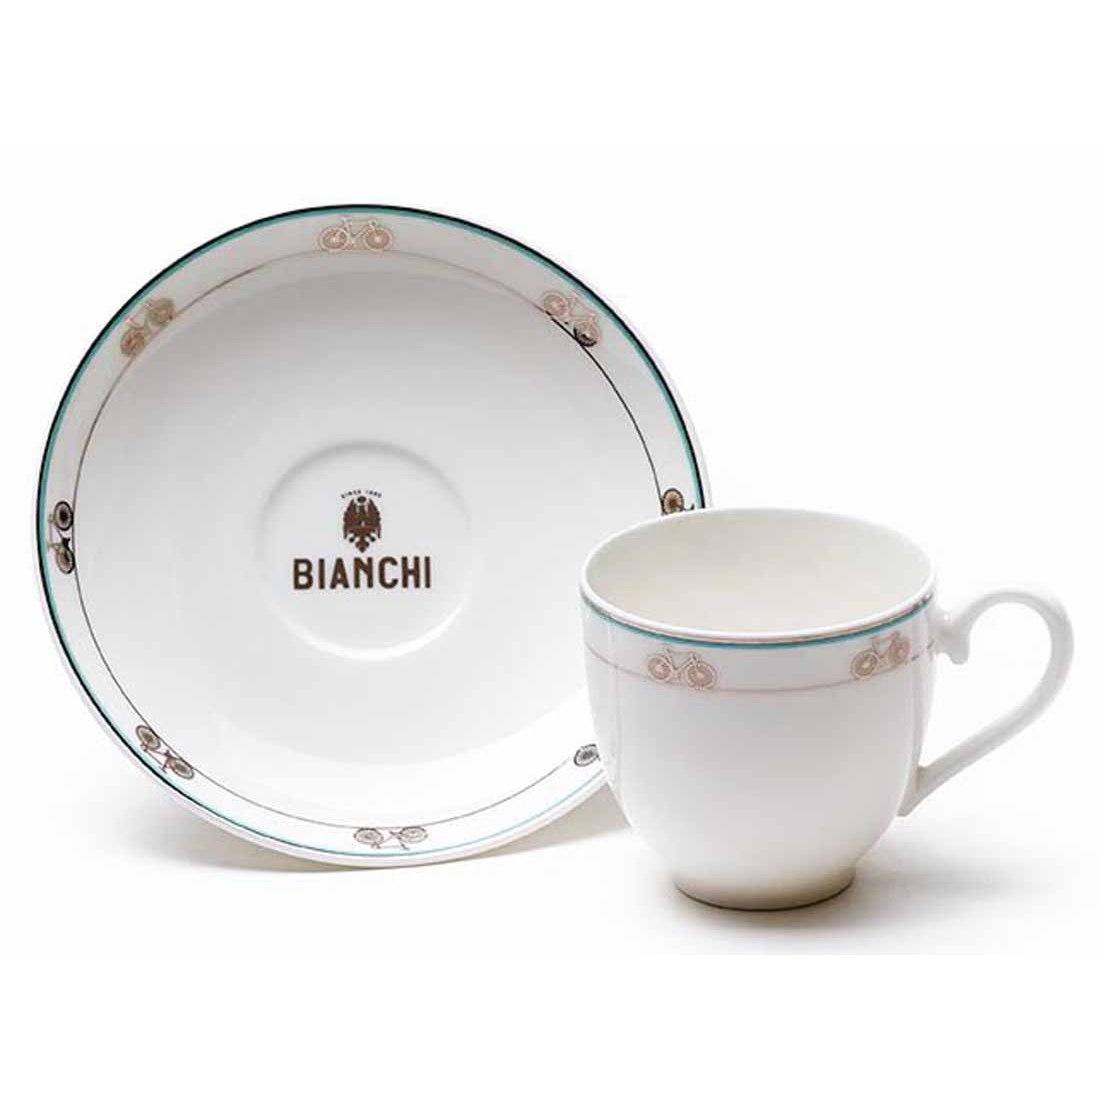 Bianchi Café&Cycles Espresso Cup / Saucer Set